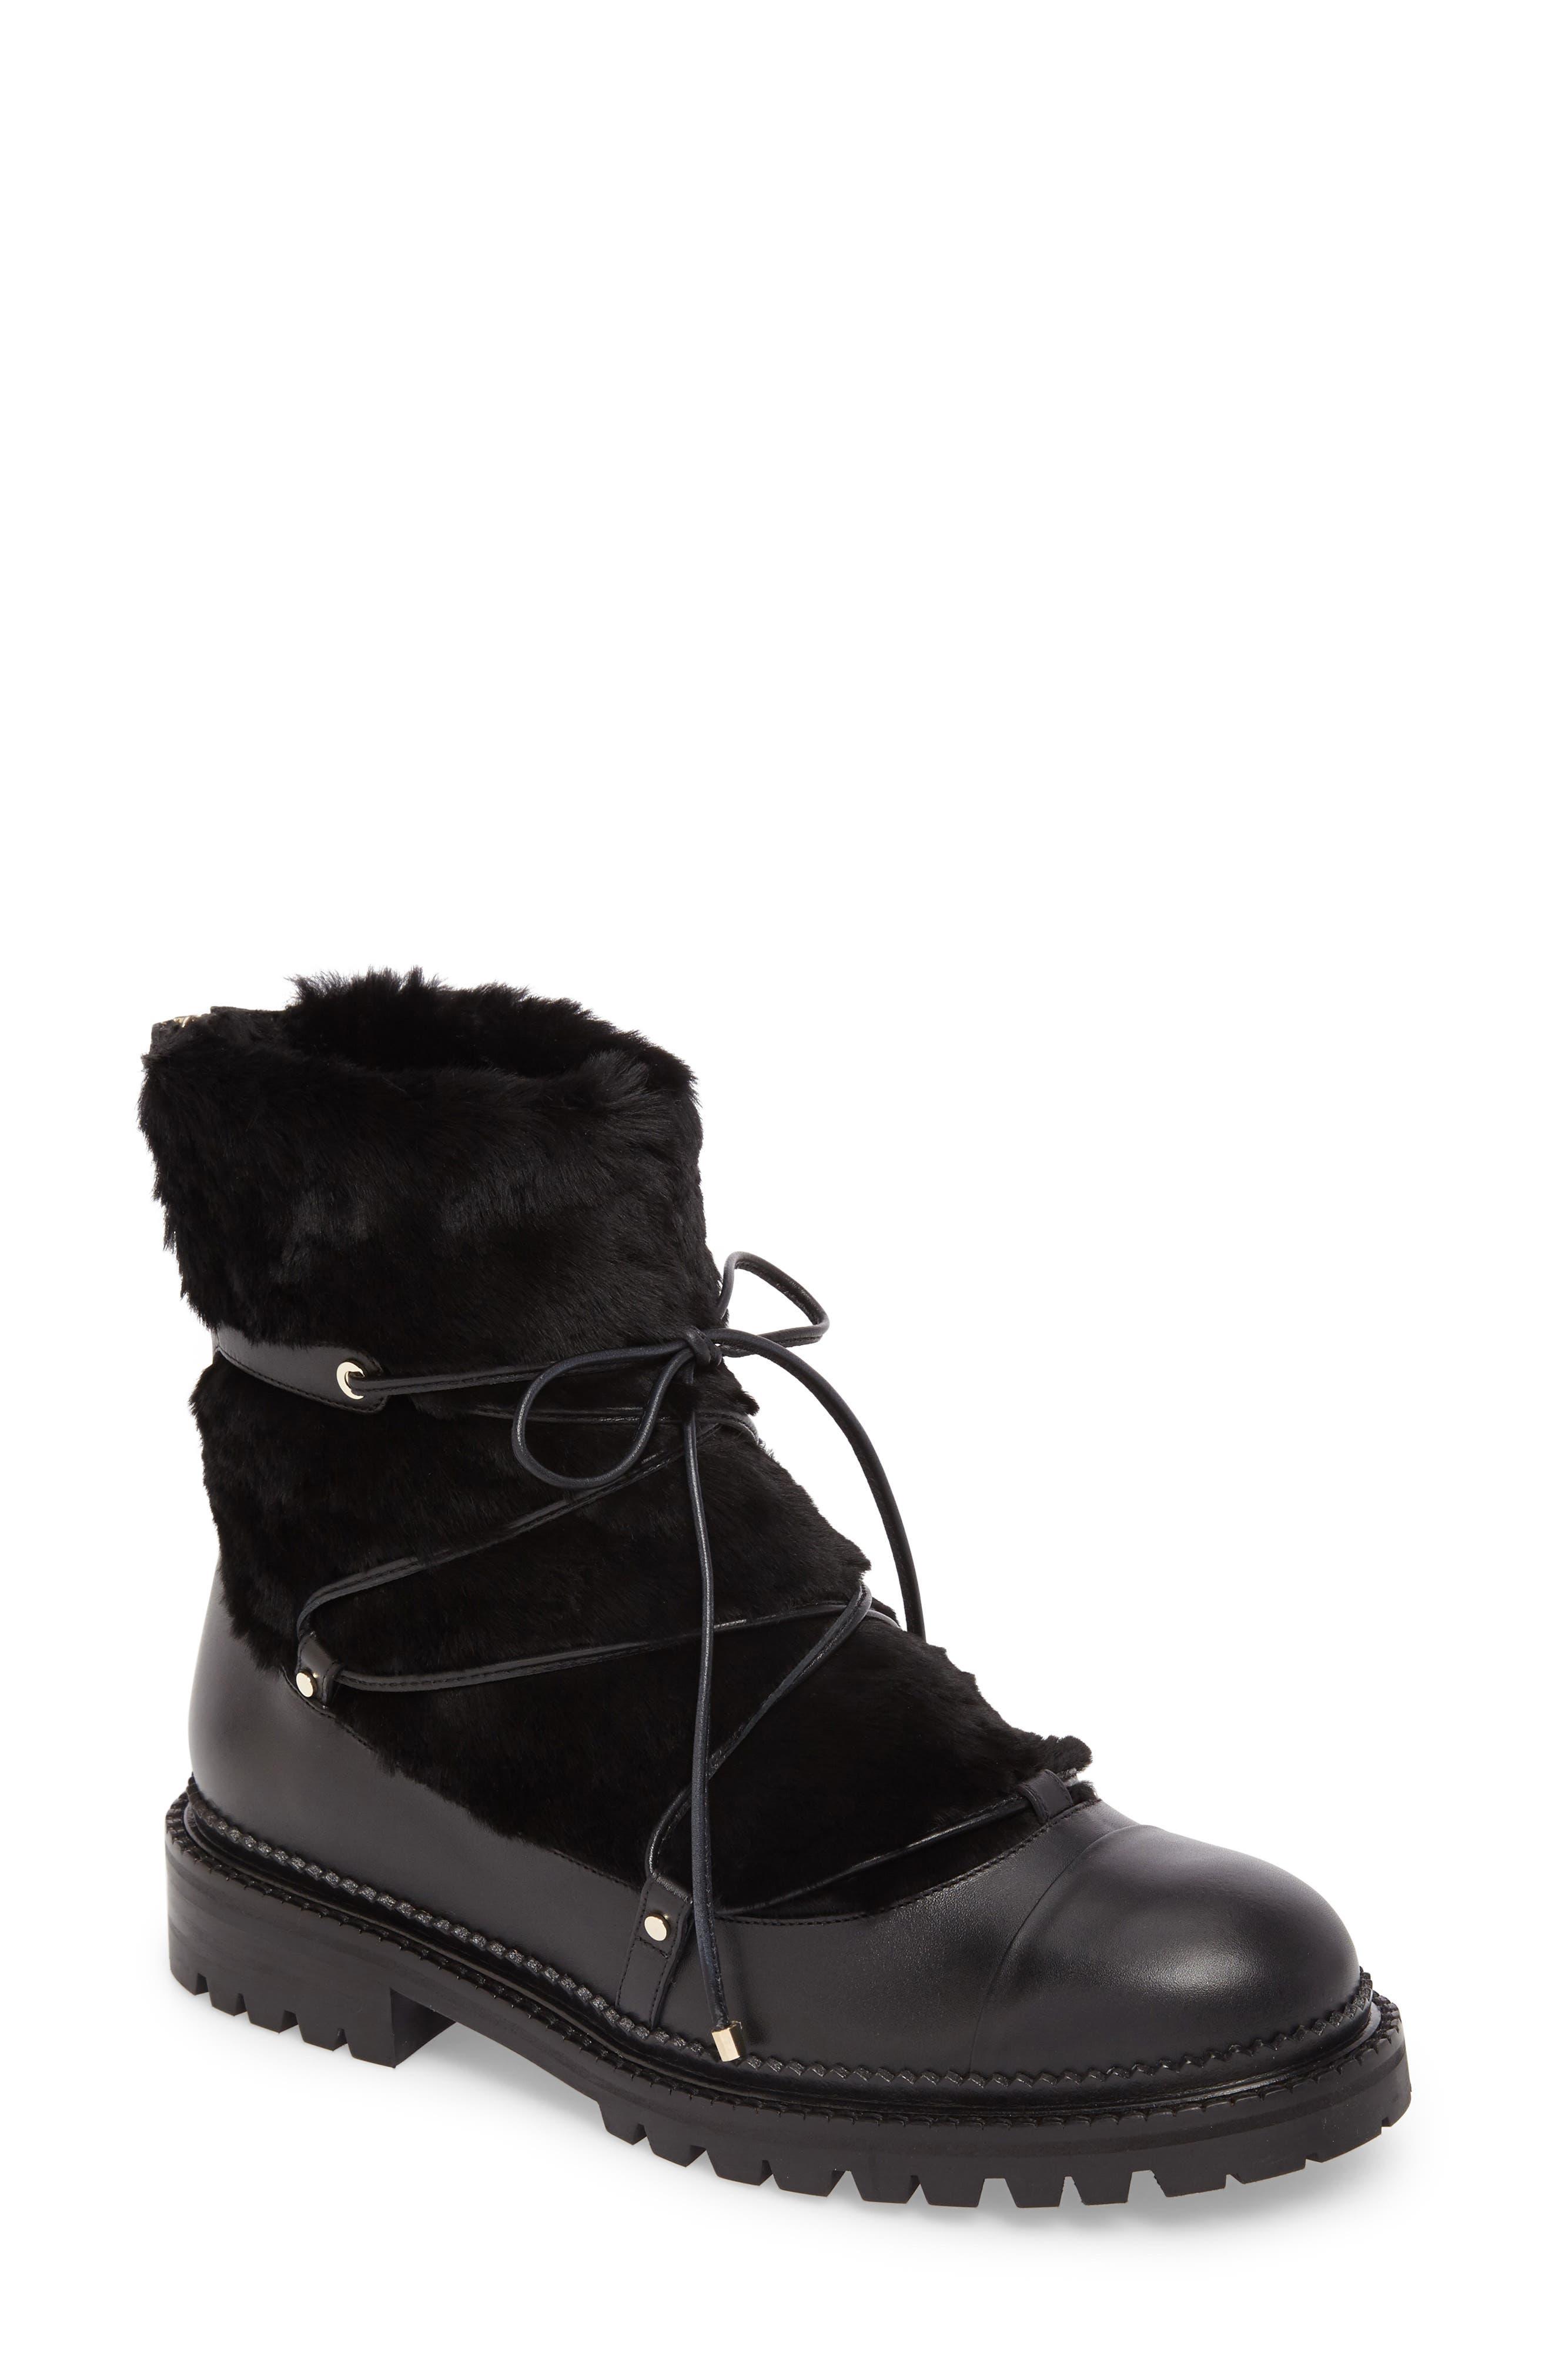 Darcie Genuine Shearling Boot,                             Main thumbnail 1, color,                             001